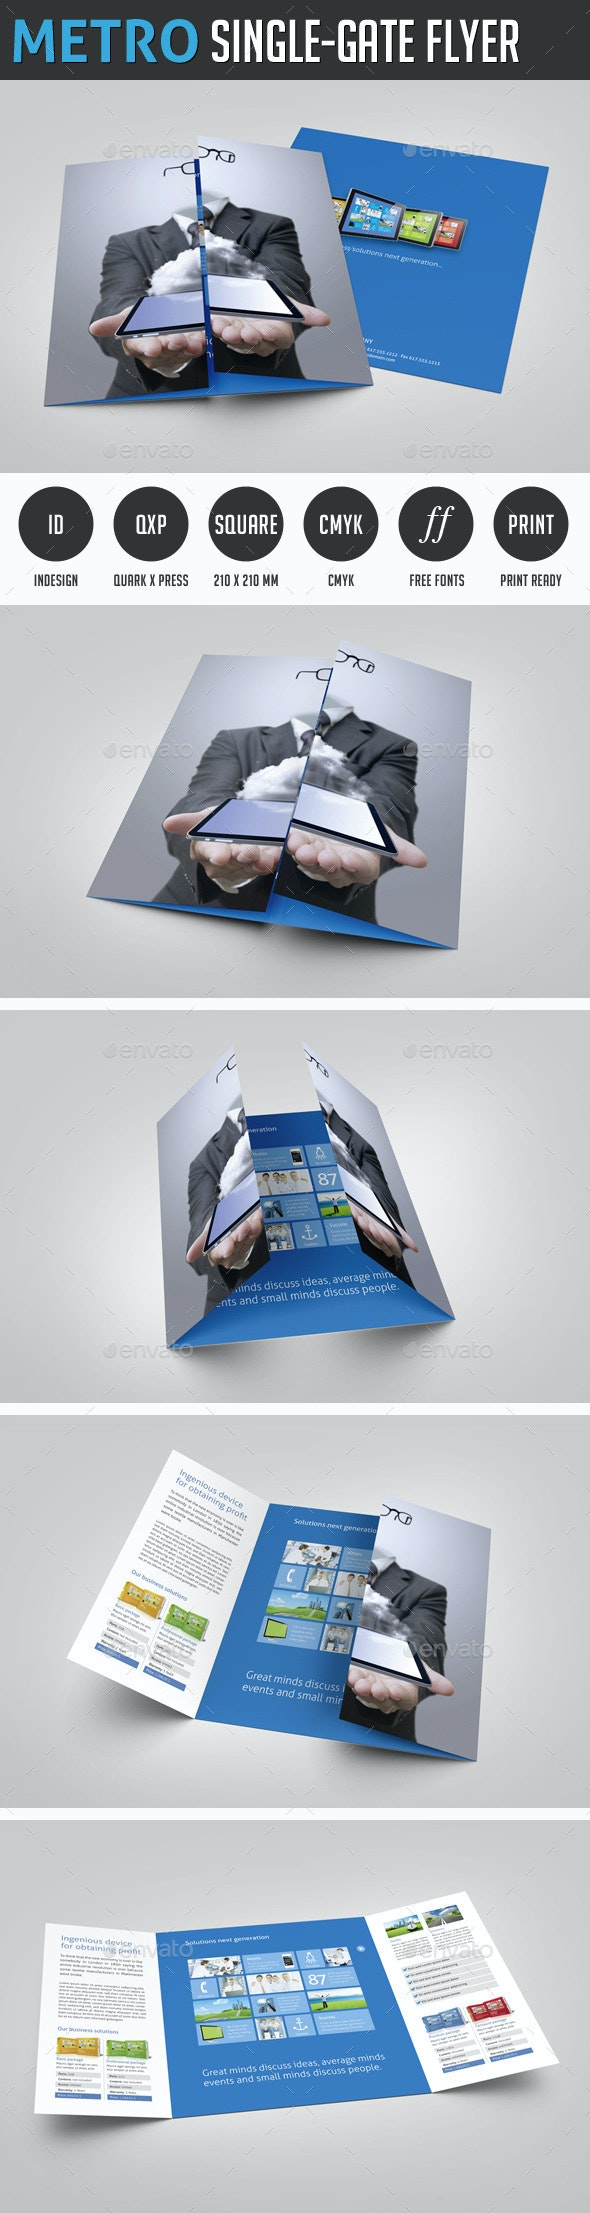 Metro Single Gate Flyer - Corporate Brochures